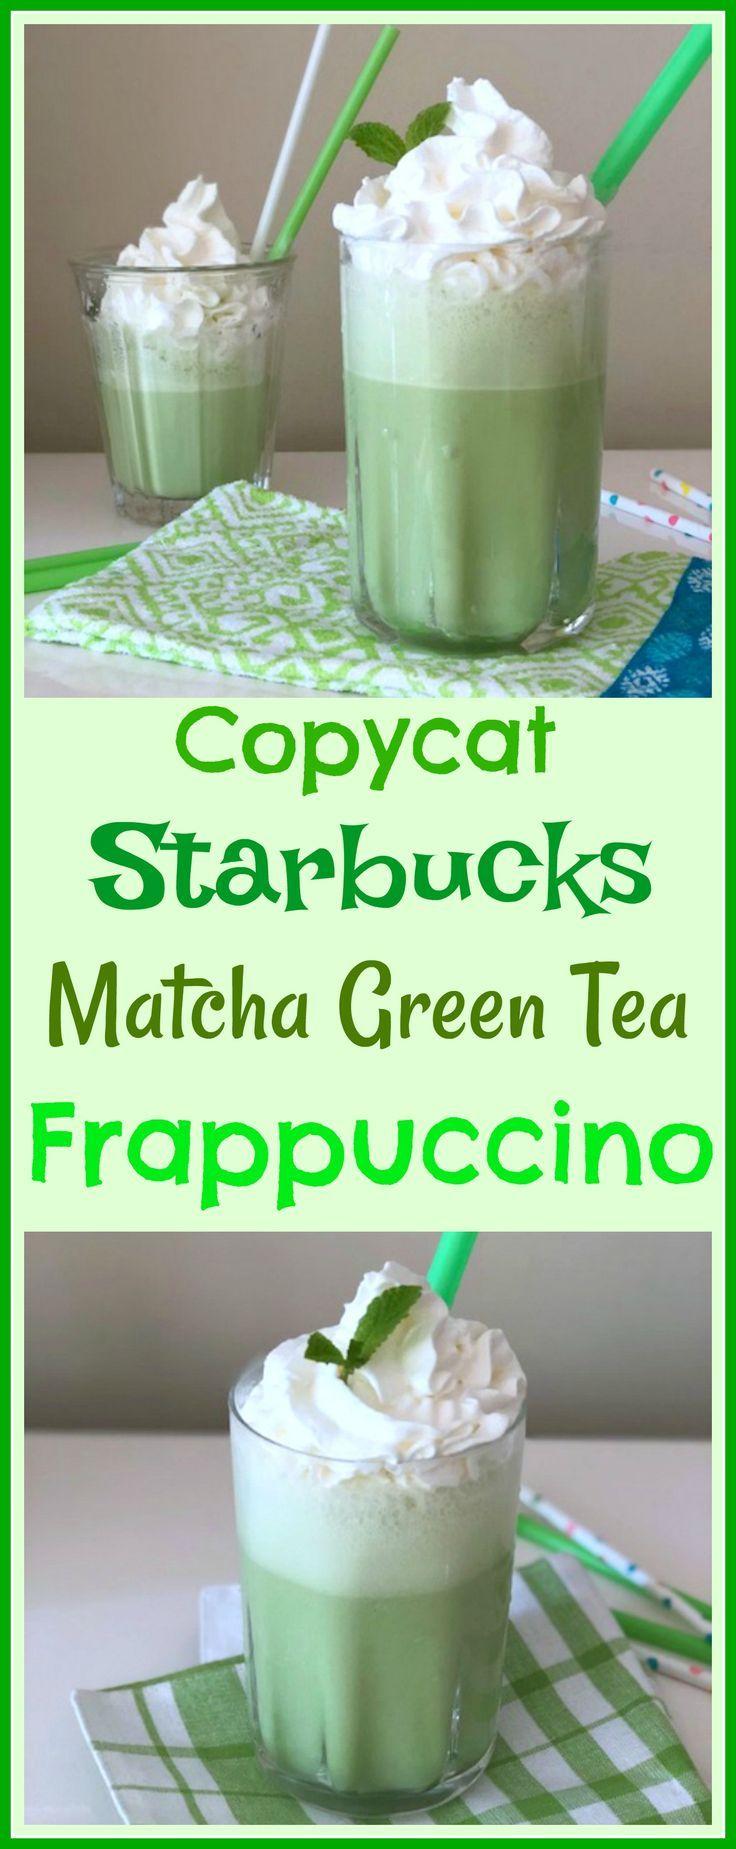 Copycat starbucks matcha green tea frappuccino recipe